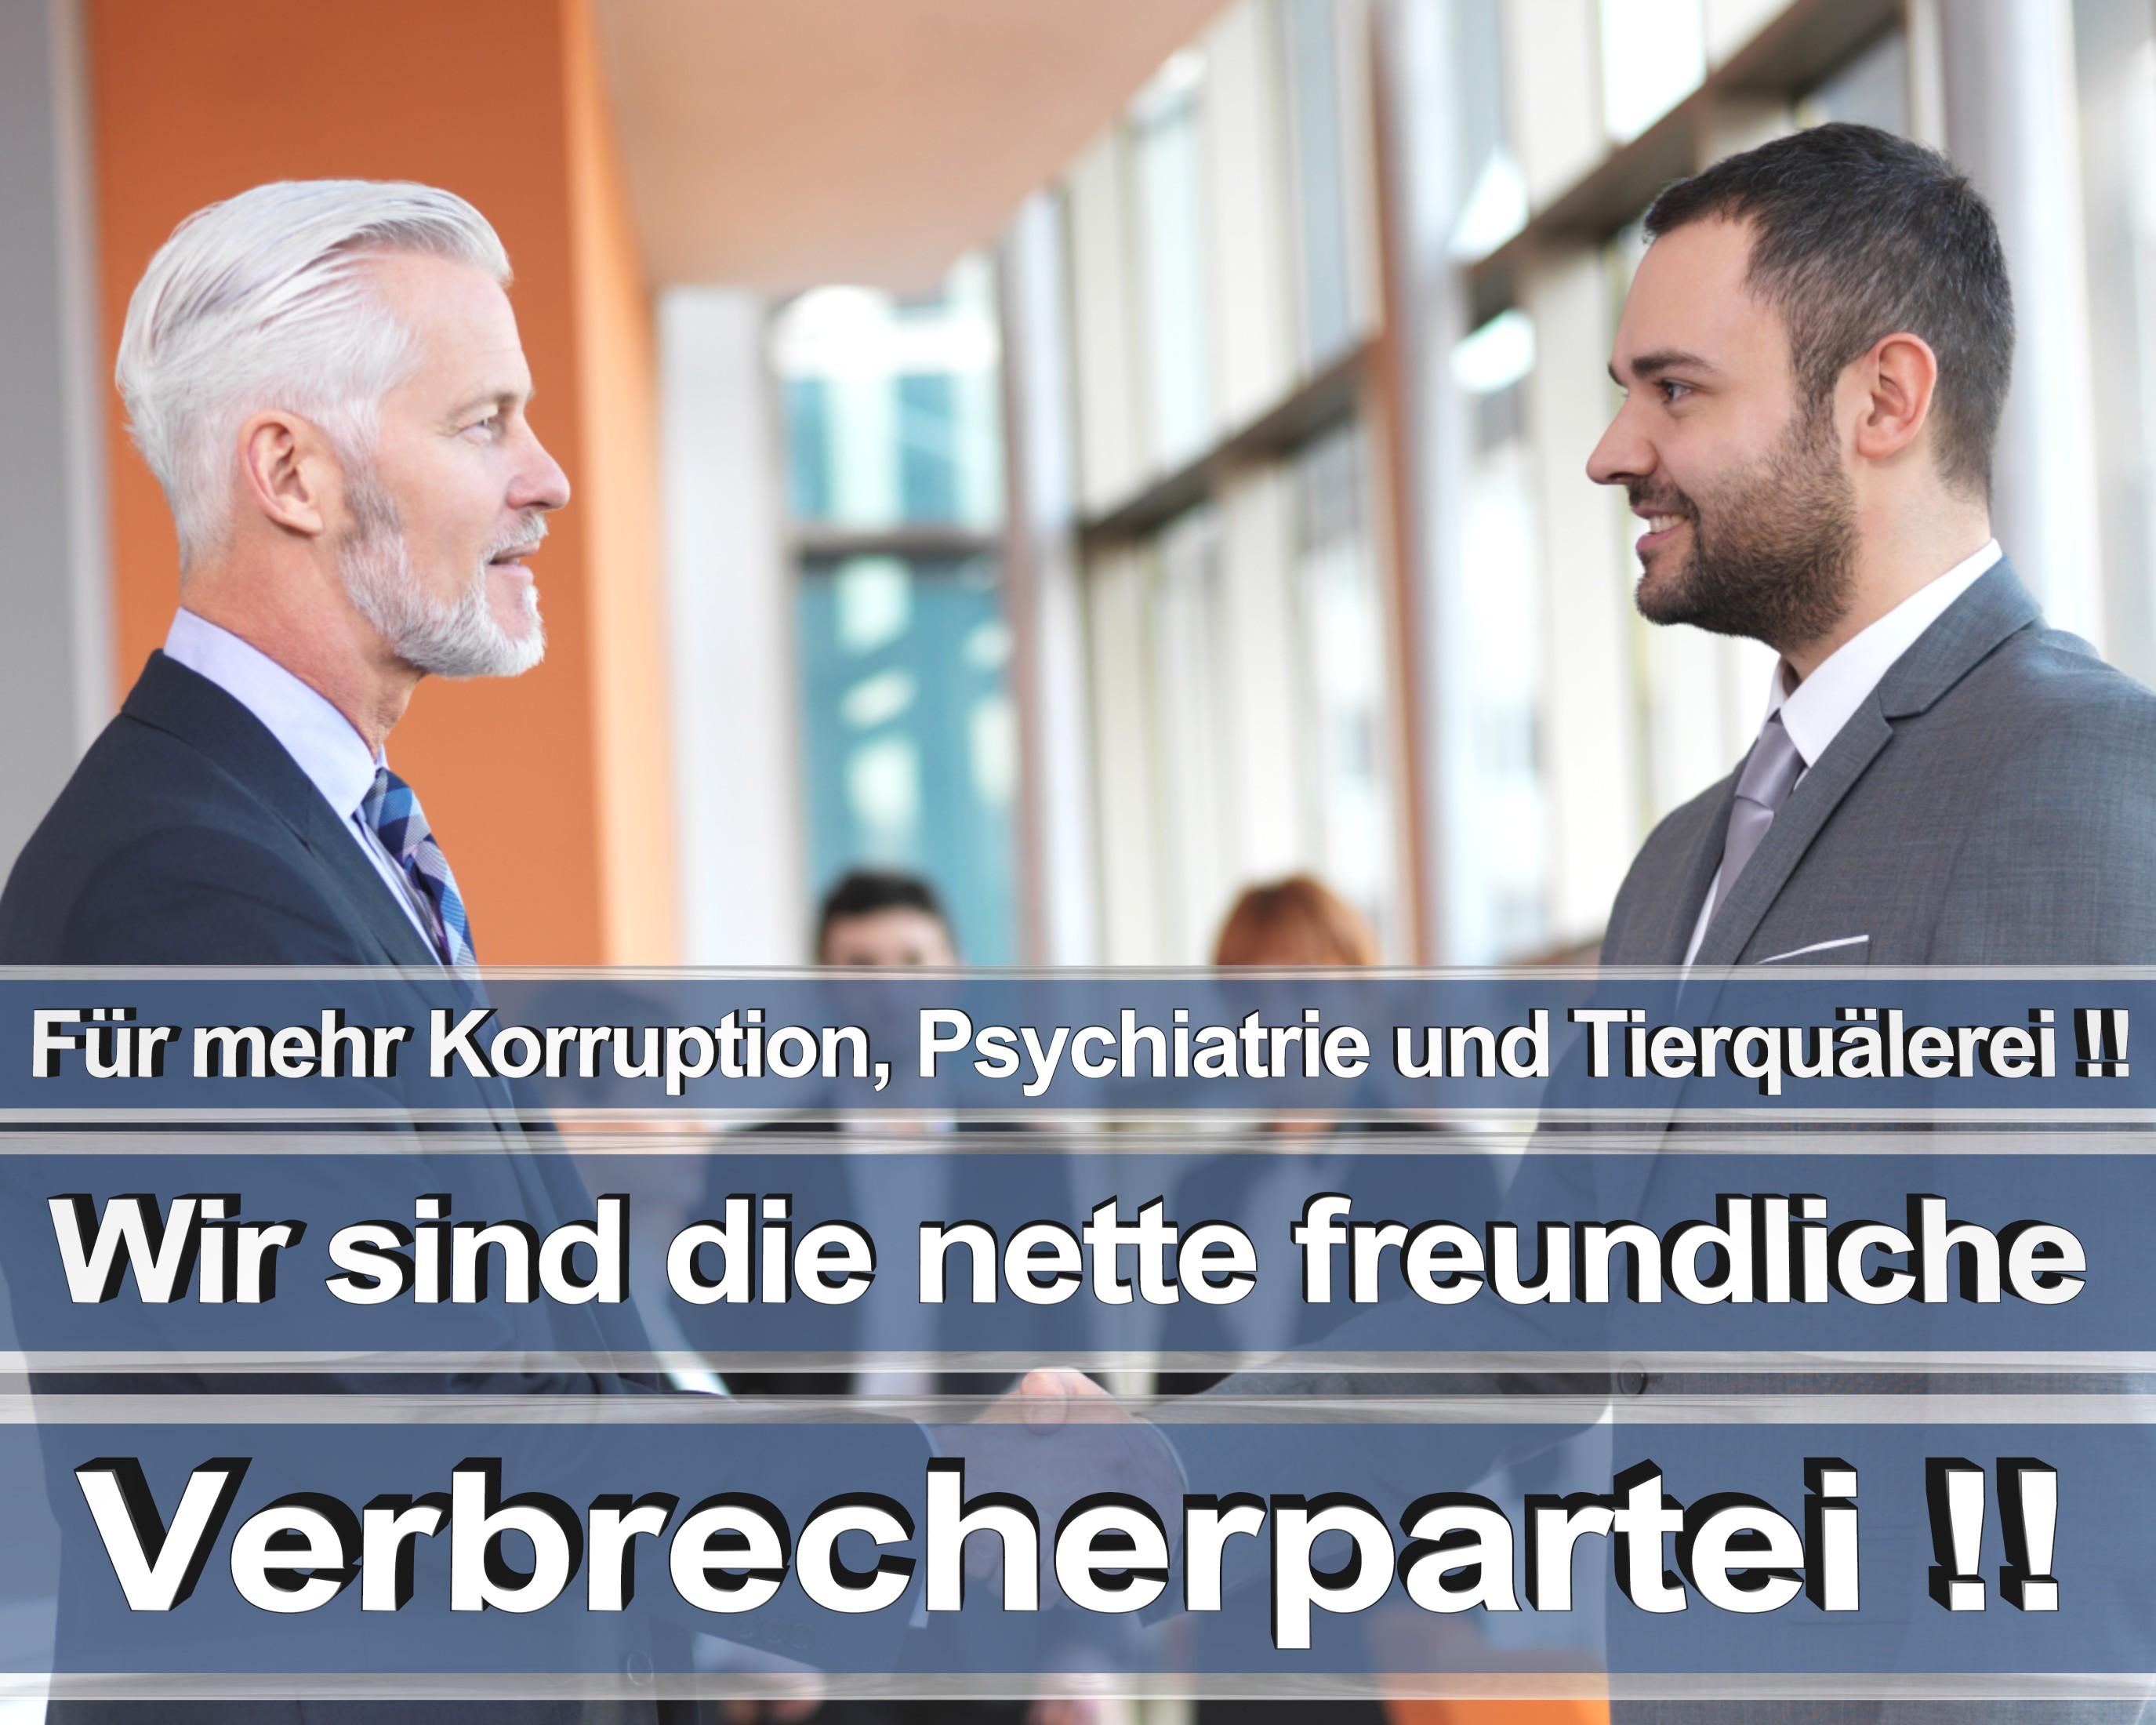 FDP Bielefeld Jan Maik Schlifter, Jasmin Wahl Schwentker, Jens Andernacht, Laura Schubert, Dr Klaus Schleicher, Rainer Seifert (2)